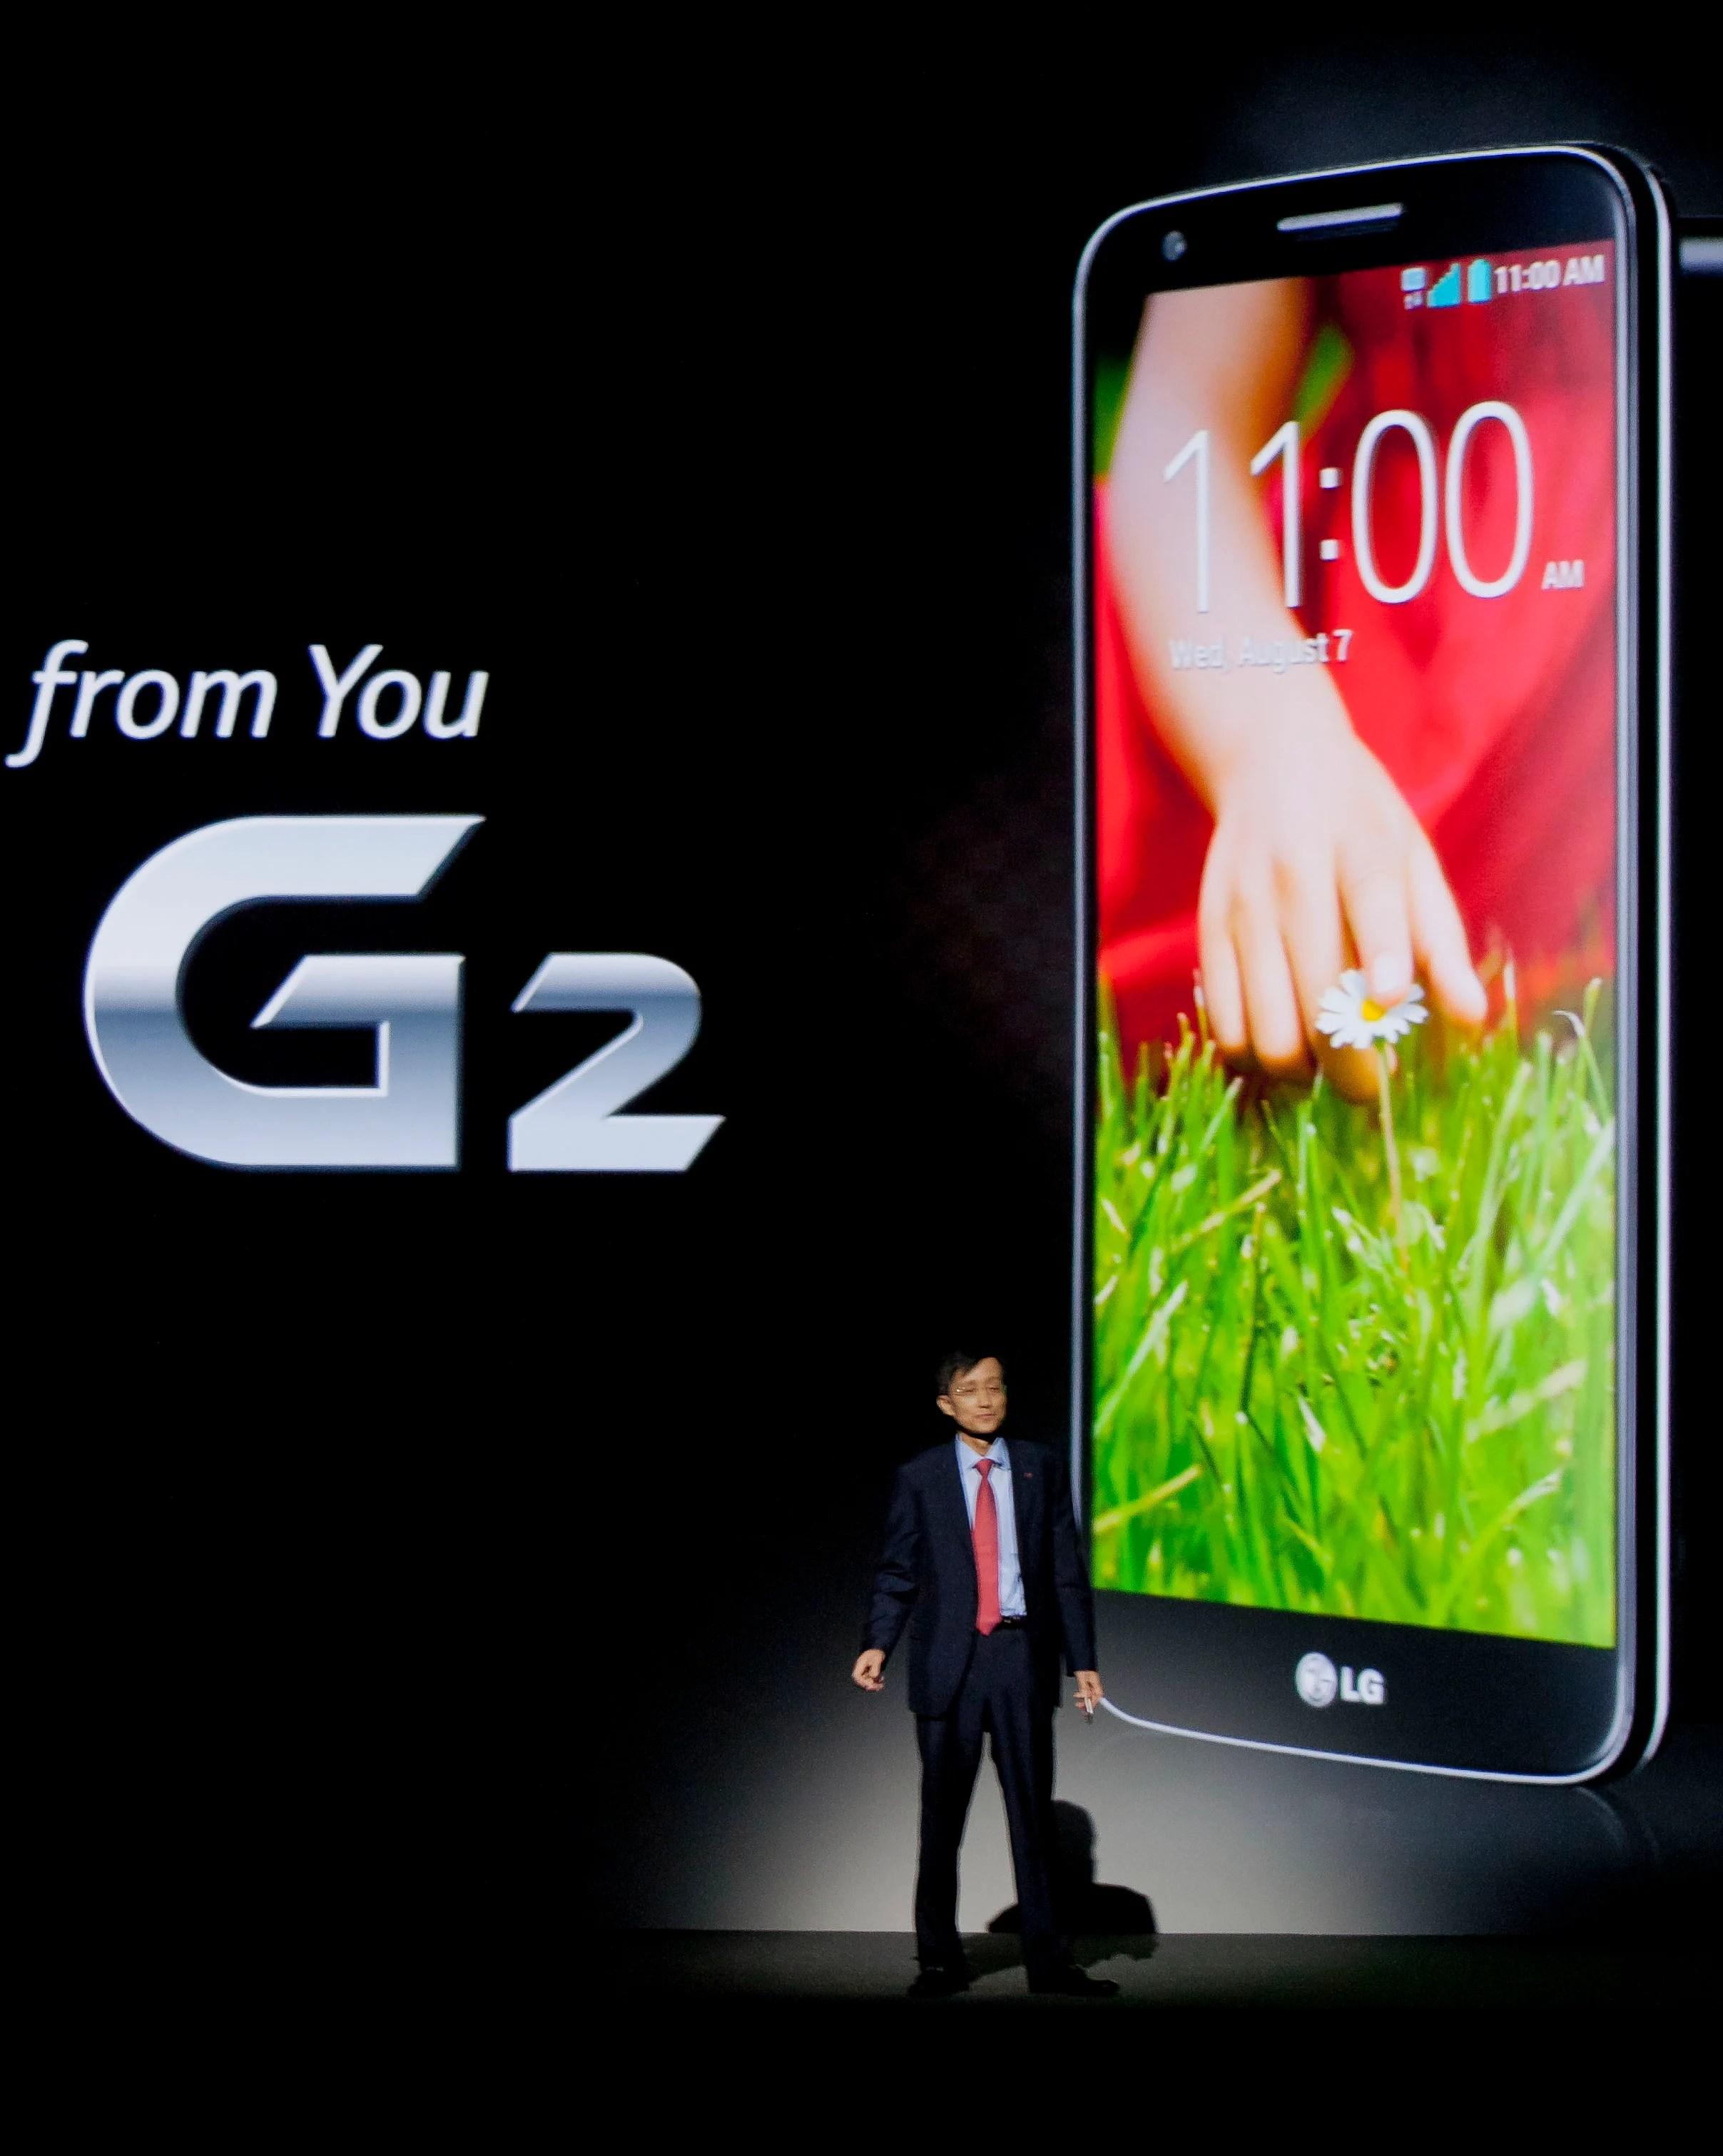 LG G2 : des benchmarks impressionnants sur AnTuTu et Quandrant